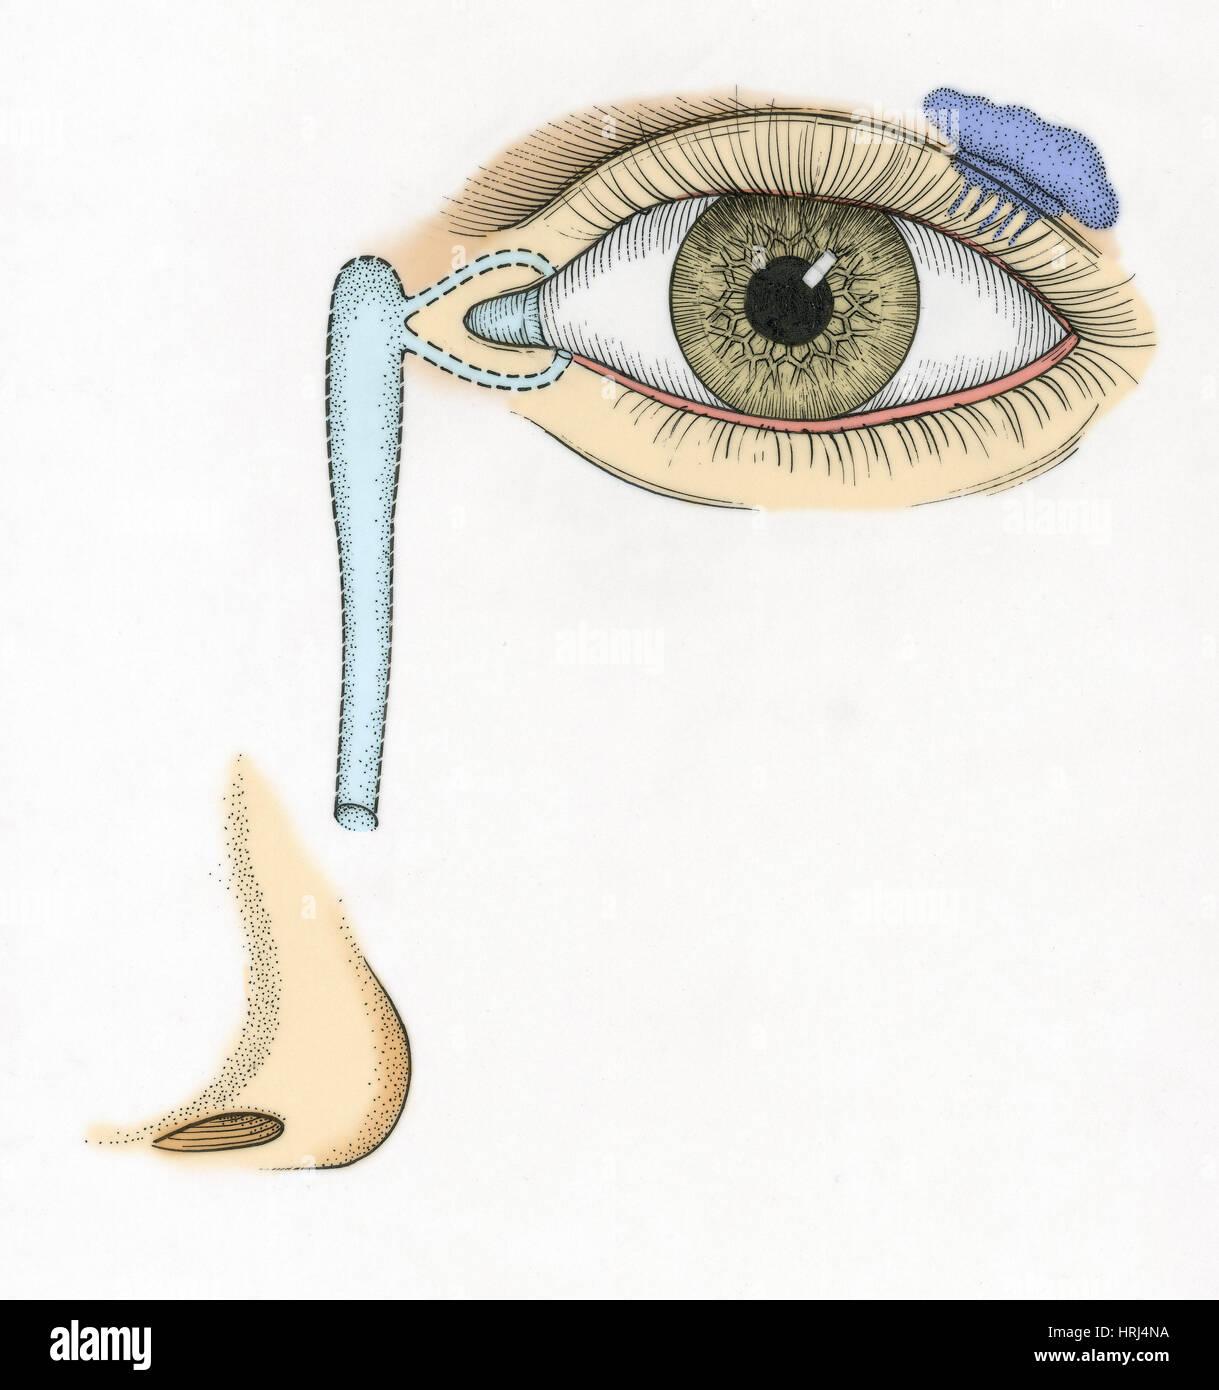 Illustration of Tear Duct Stock Photo: 135008534 - Alamy